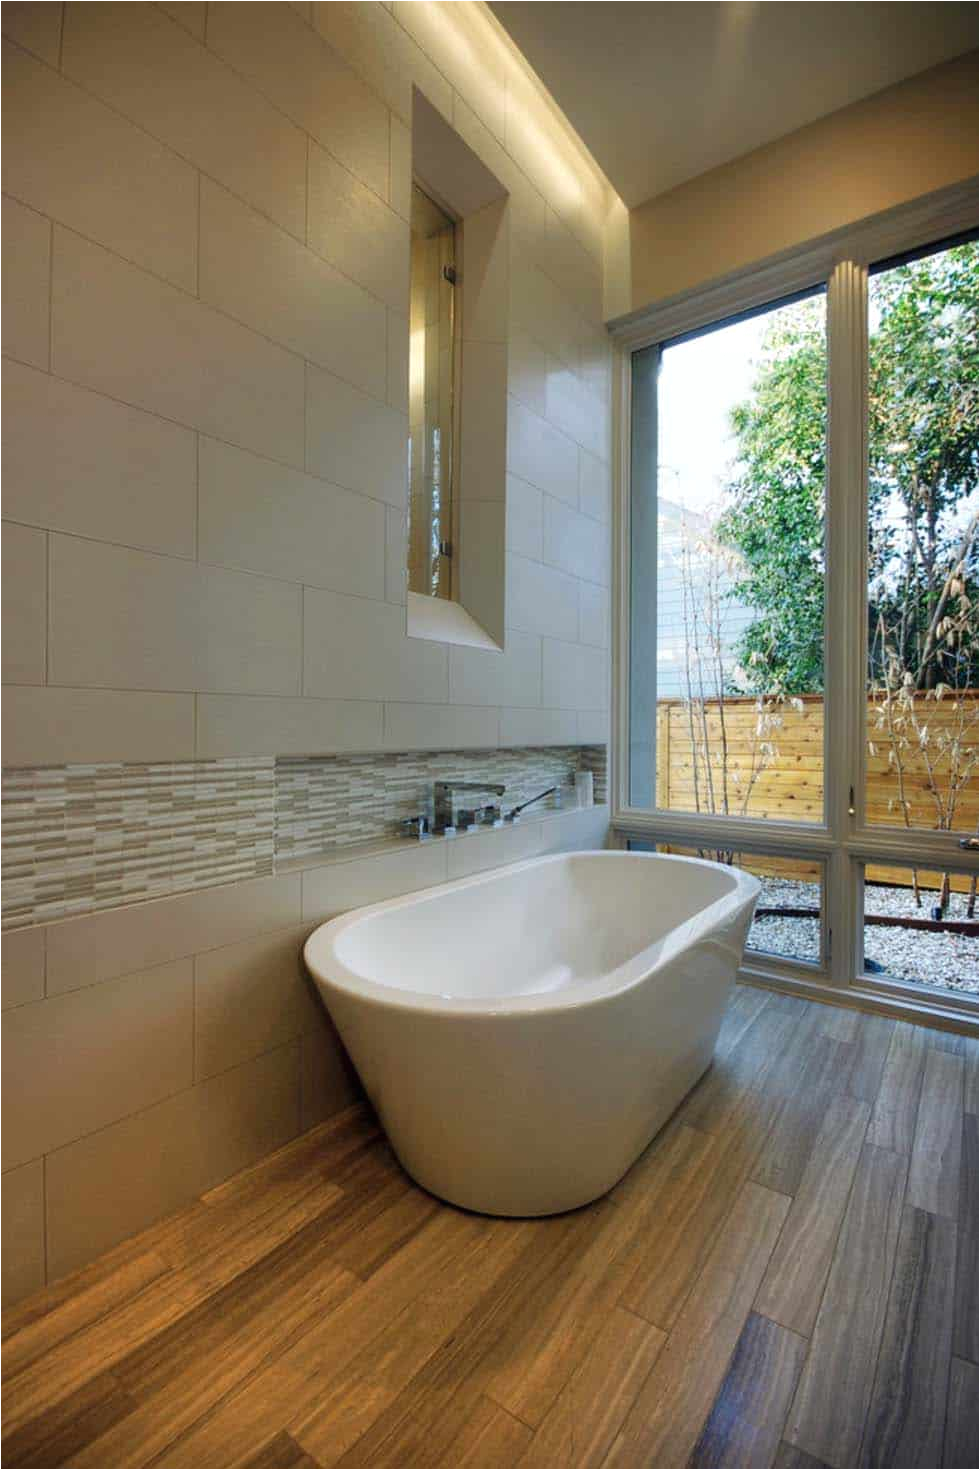 Freestanding Bathtub Wall Faucet 35 Fabulous Freestanding Bathtub Ideas for A Luxurious soak